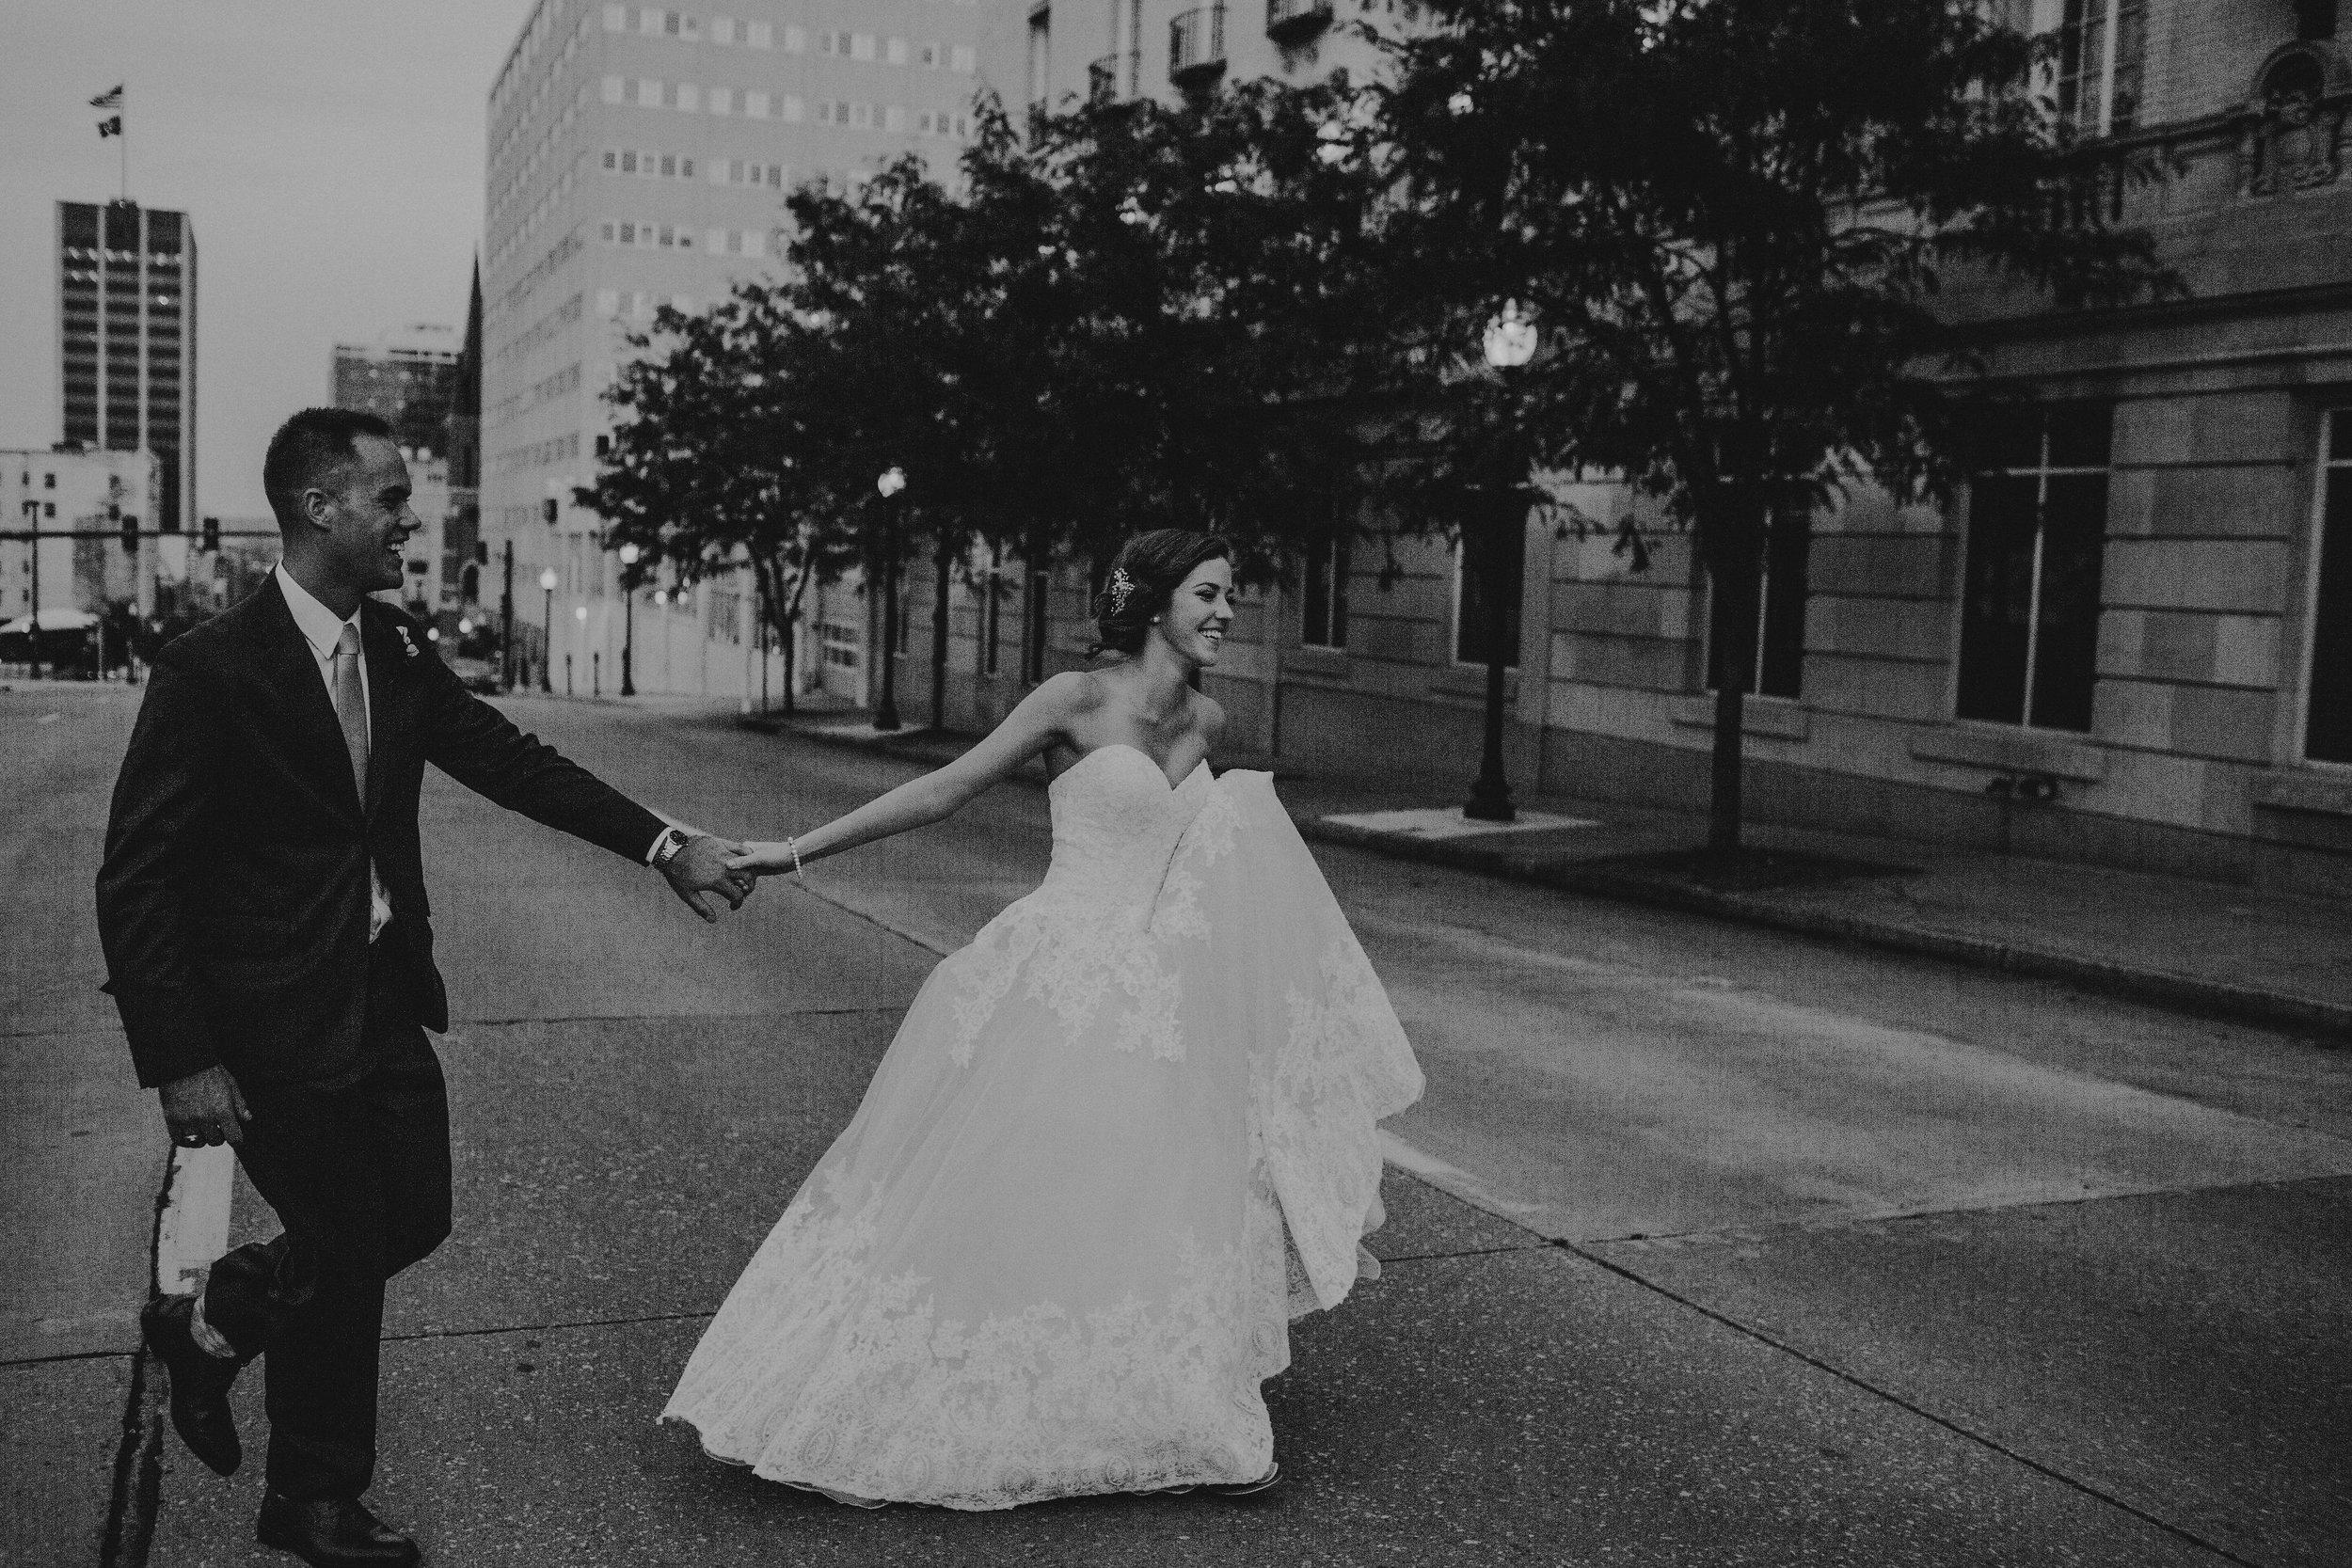 Photographer: Hope Jewell-Vinson  Hotel: Embassy Suites, Old Market  Ceremony; Citylight Benson  Reception: The Scoular Ballroom